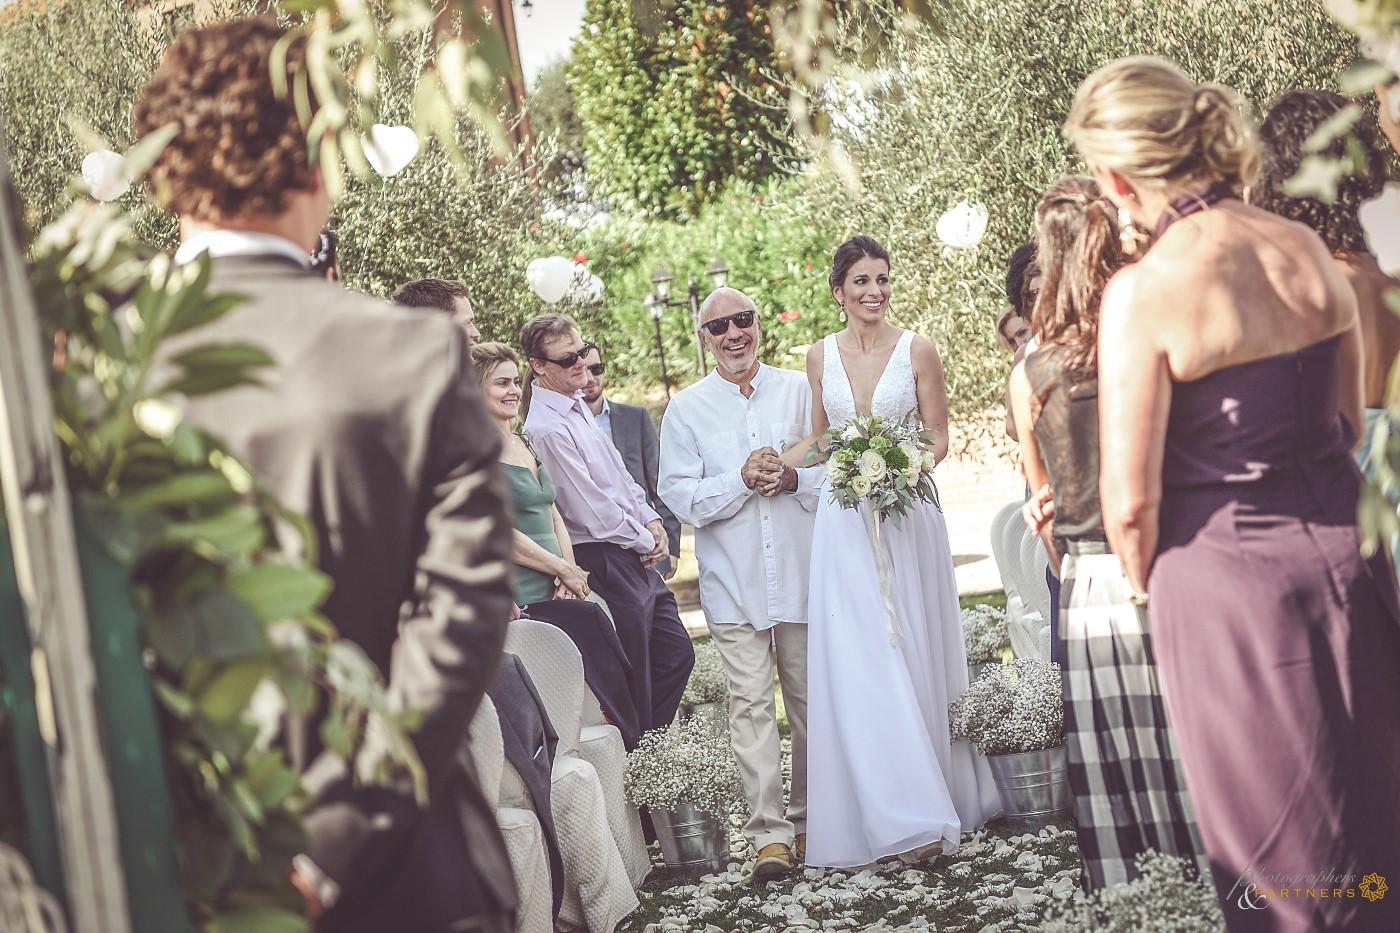 photographer_weddings_montepulciano_05.jpg